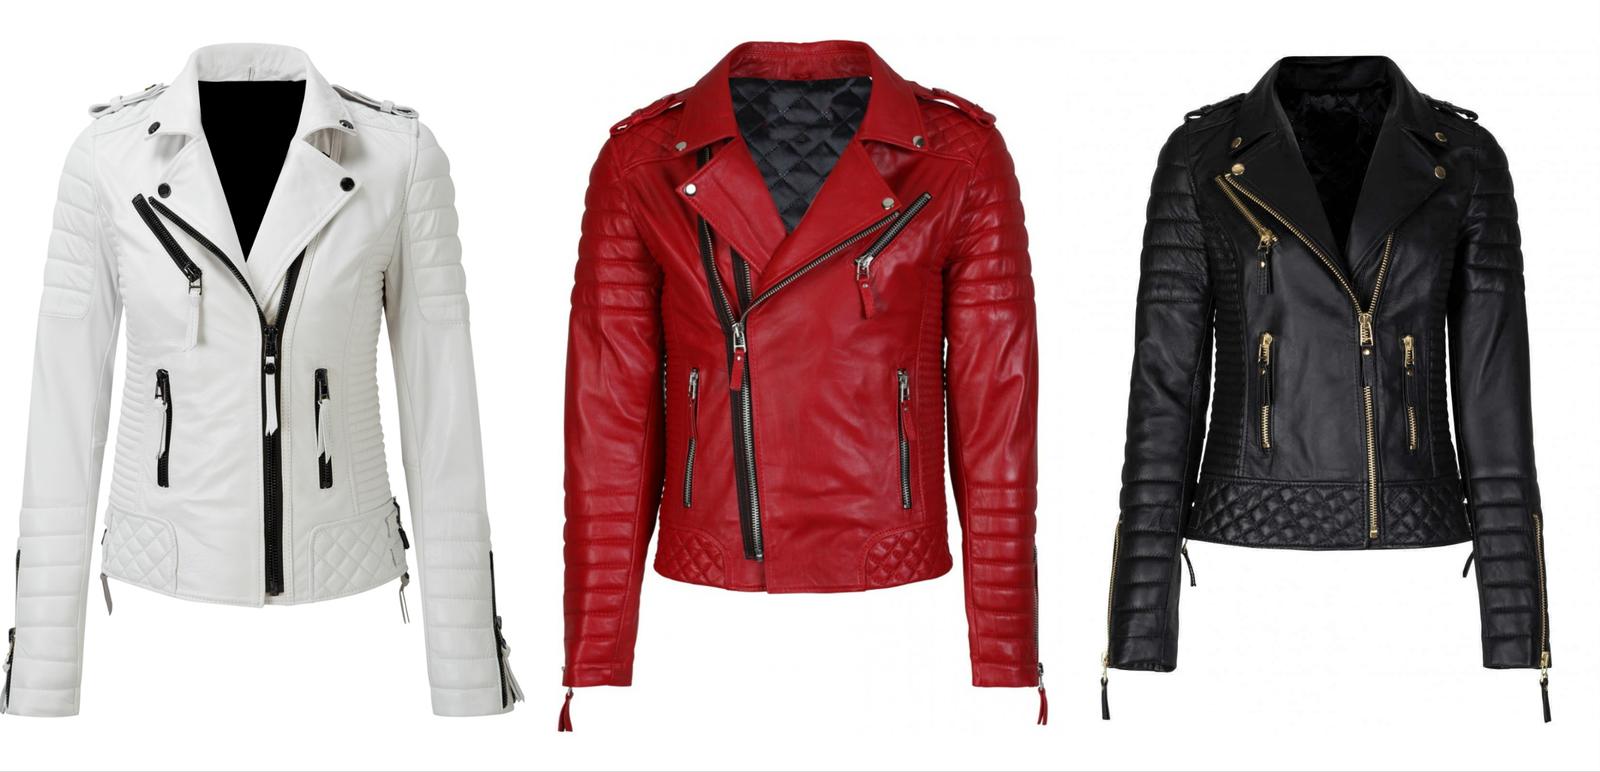 a54d38e4b74 Women's Slim Fit Biker Diamond Quilted Kay Michaels Leather Jacket ...